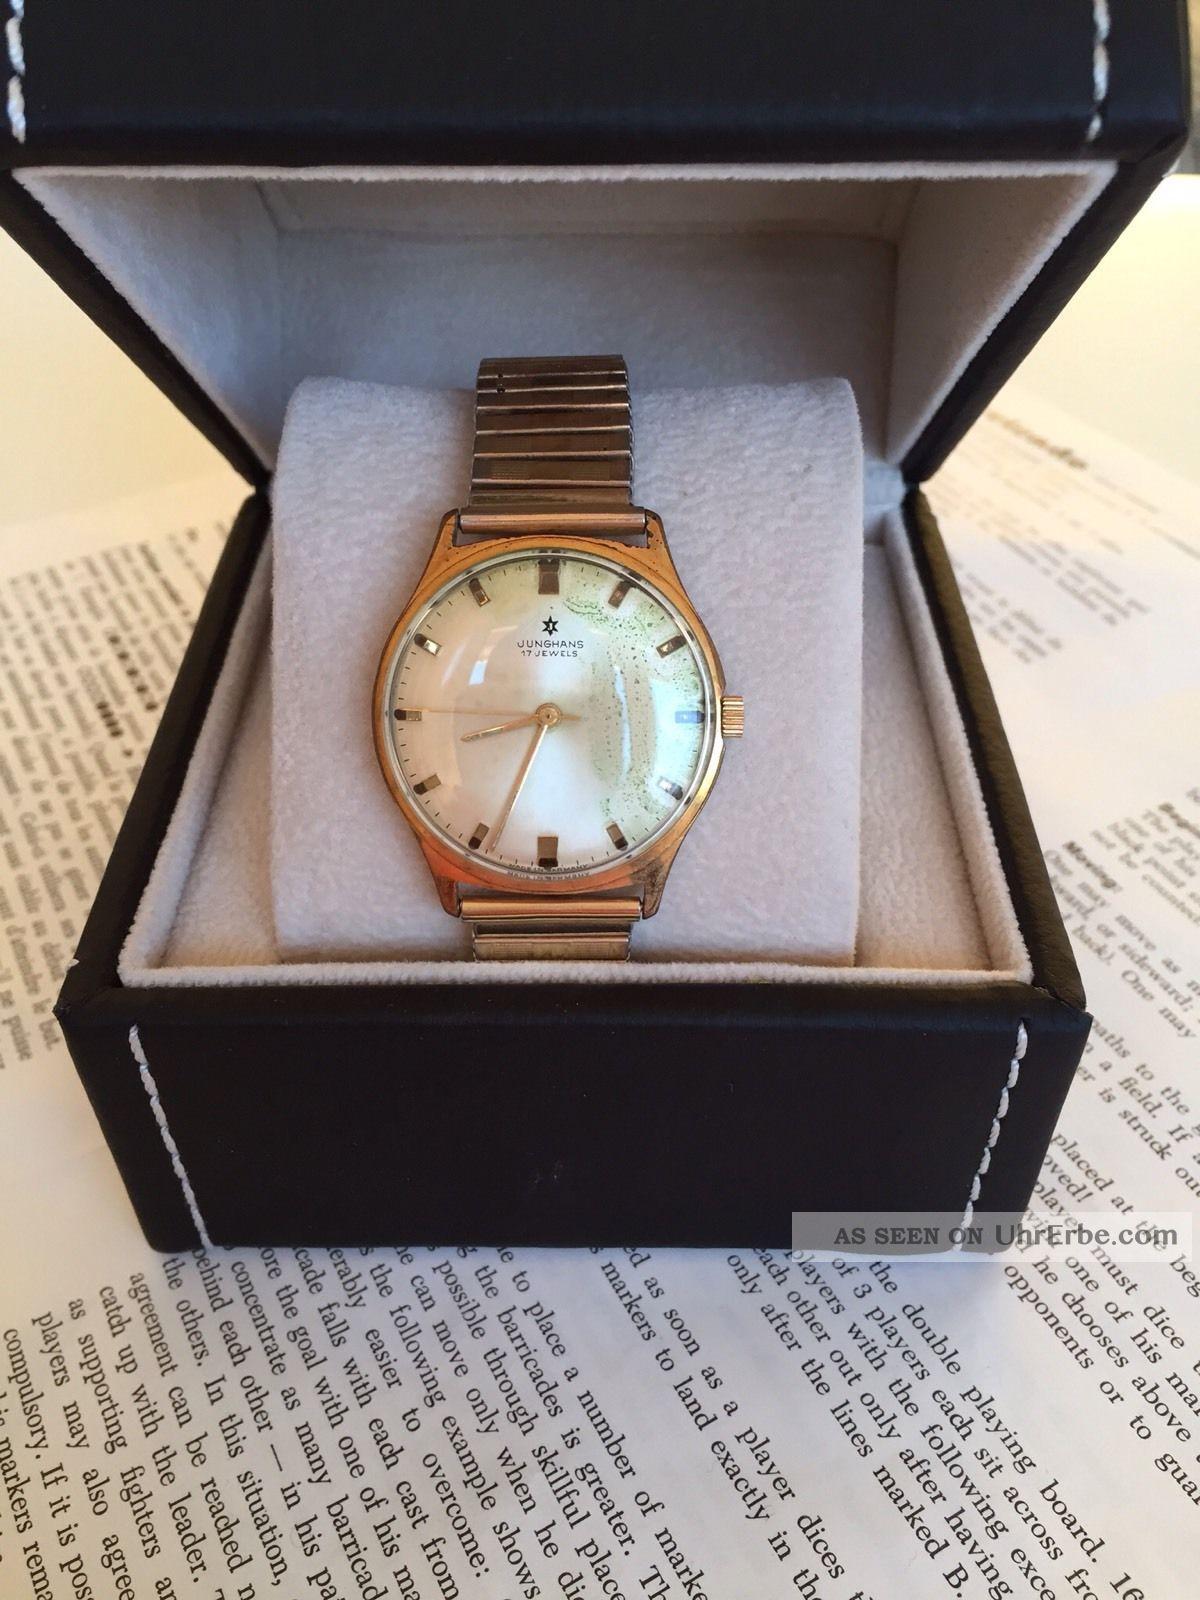 Junghans Armbanduhr Vintage,  Handaufzug,  Unisex Armbanduhren Bild